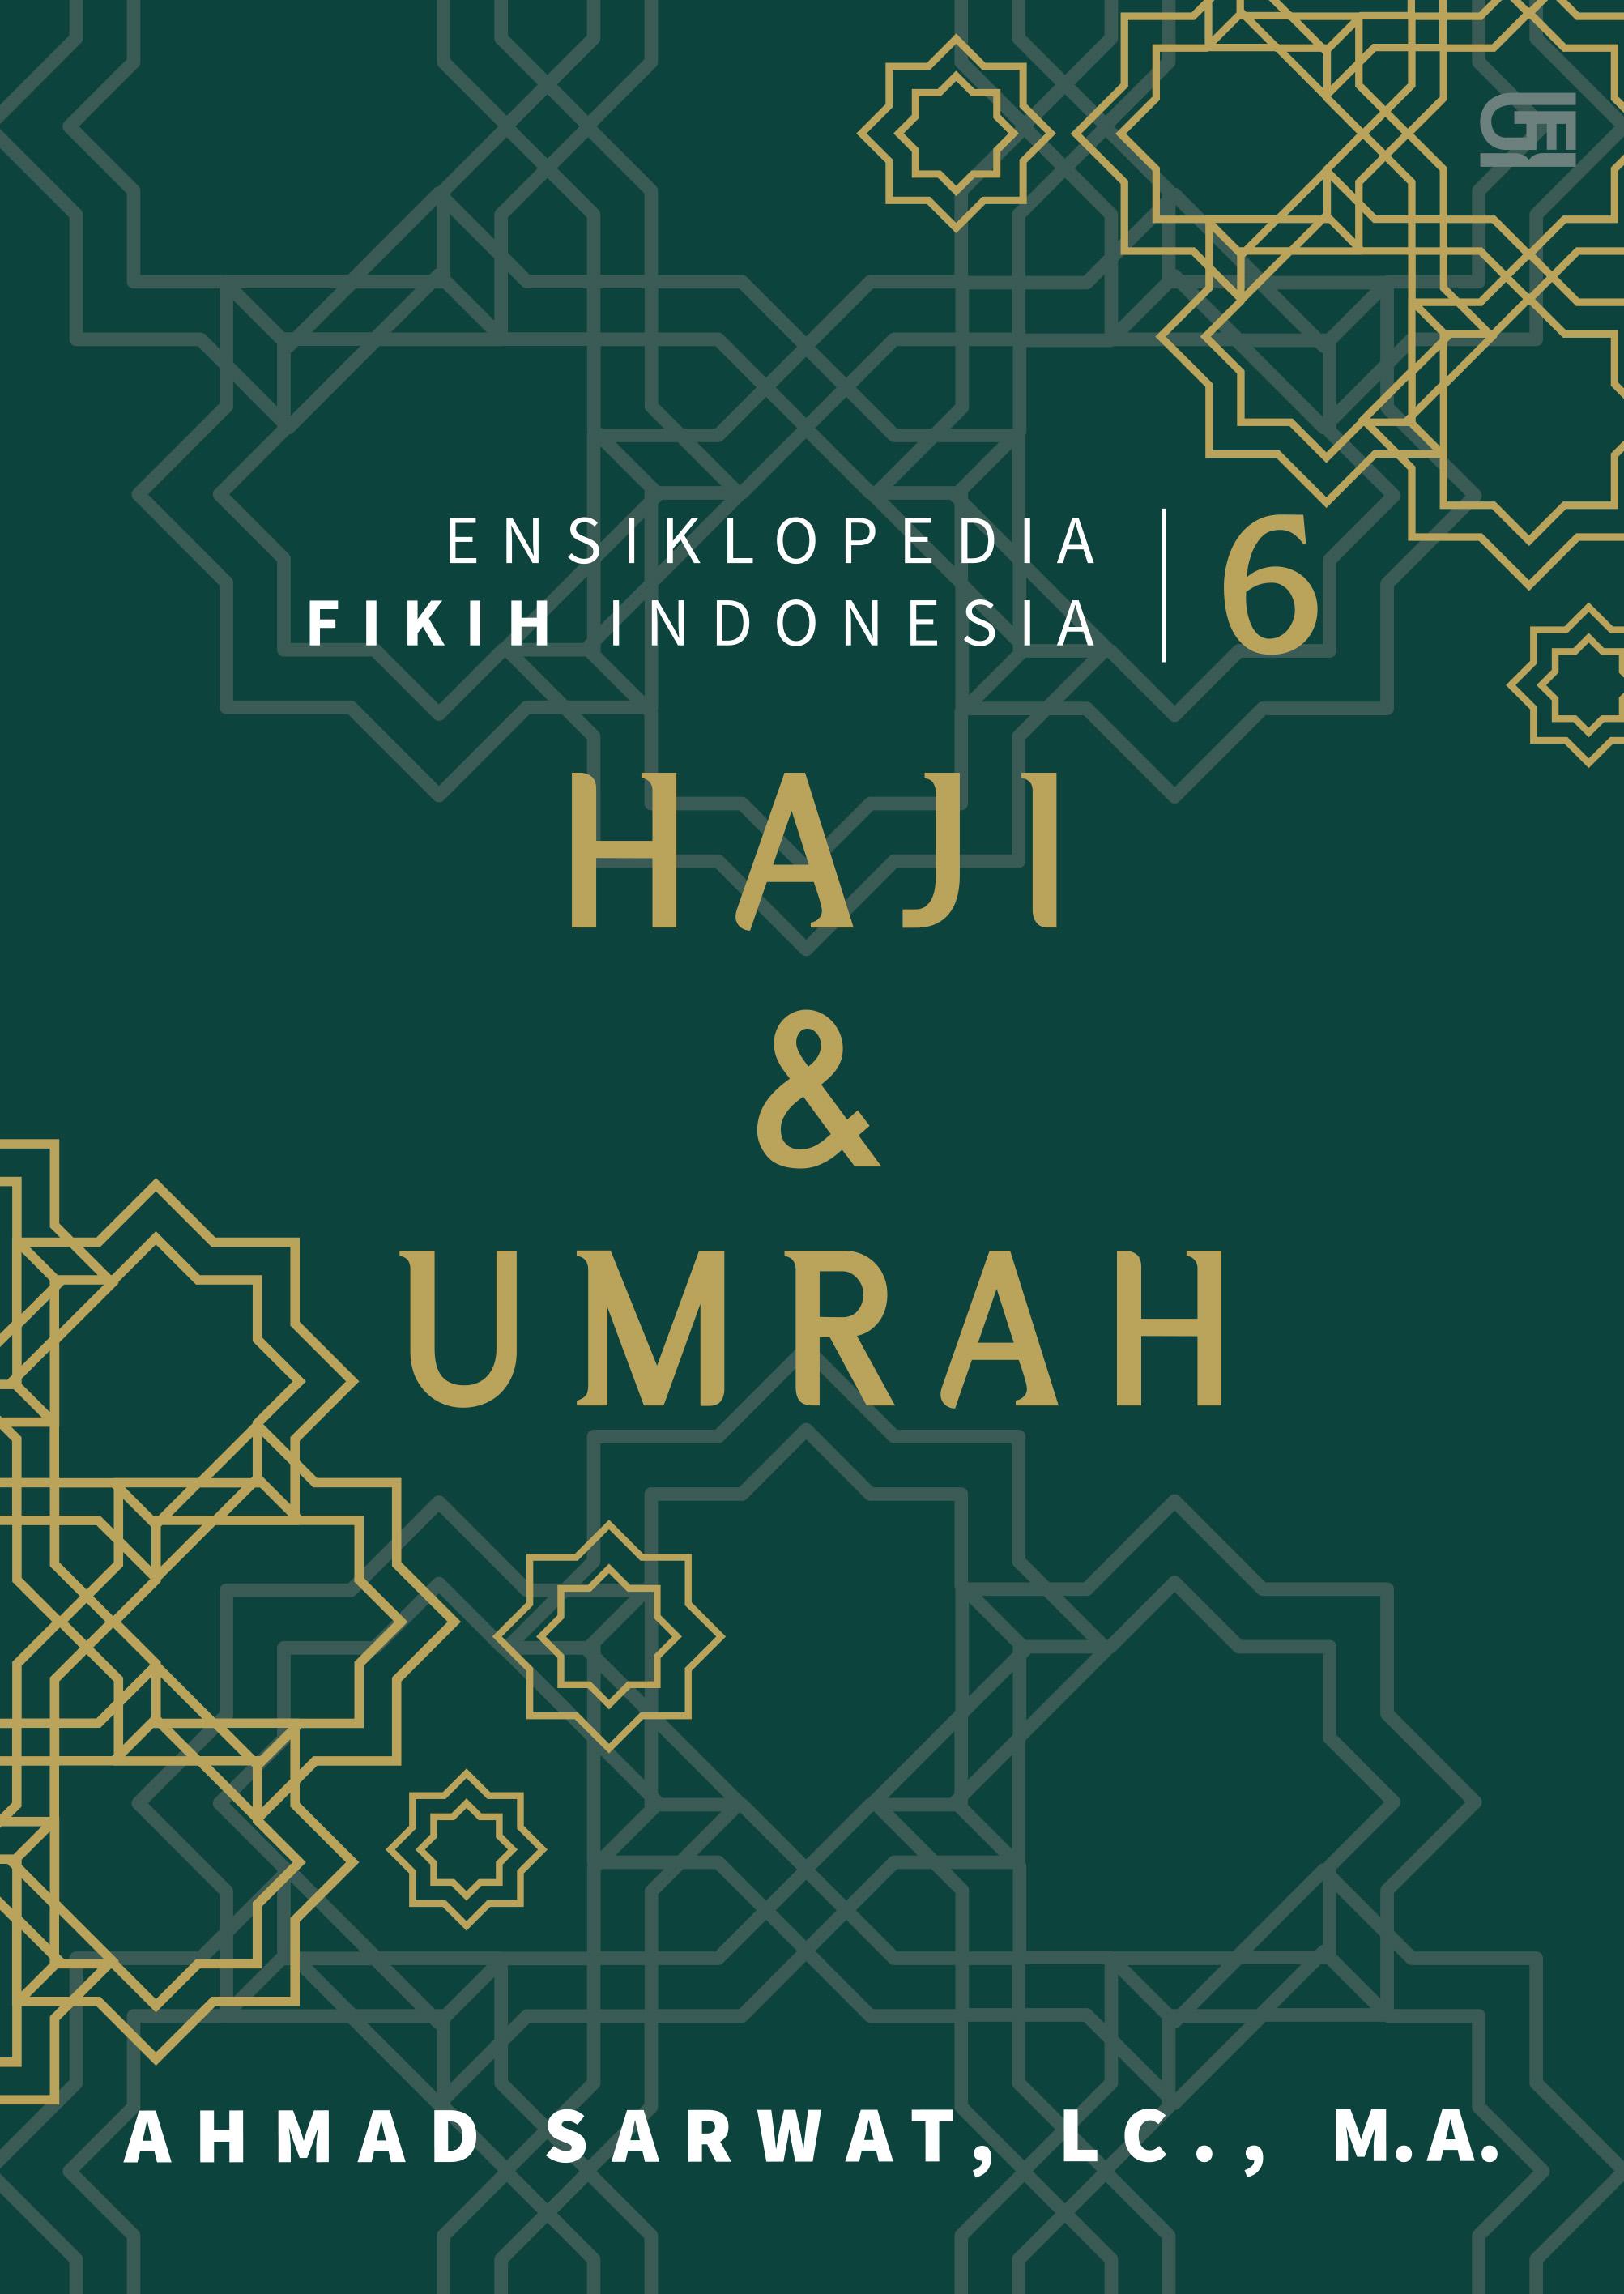 Ensiklopedia Fikih Indonesia: Haji & Umrah